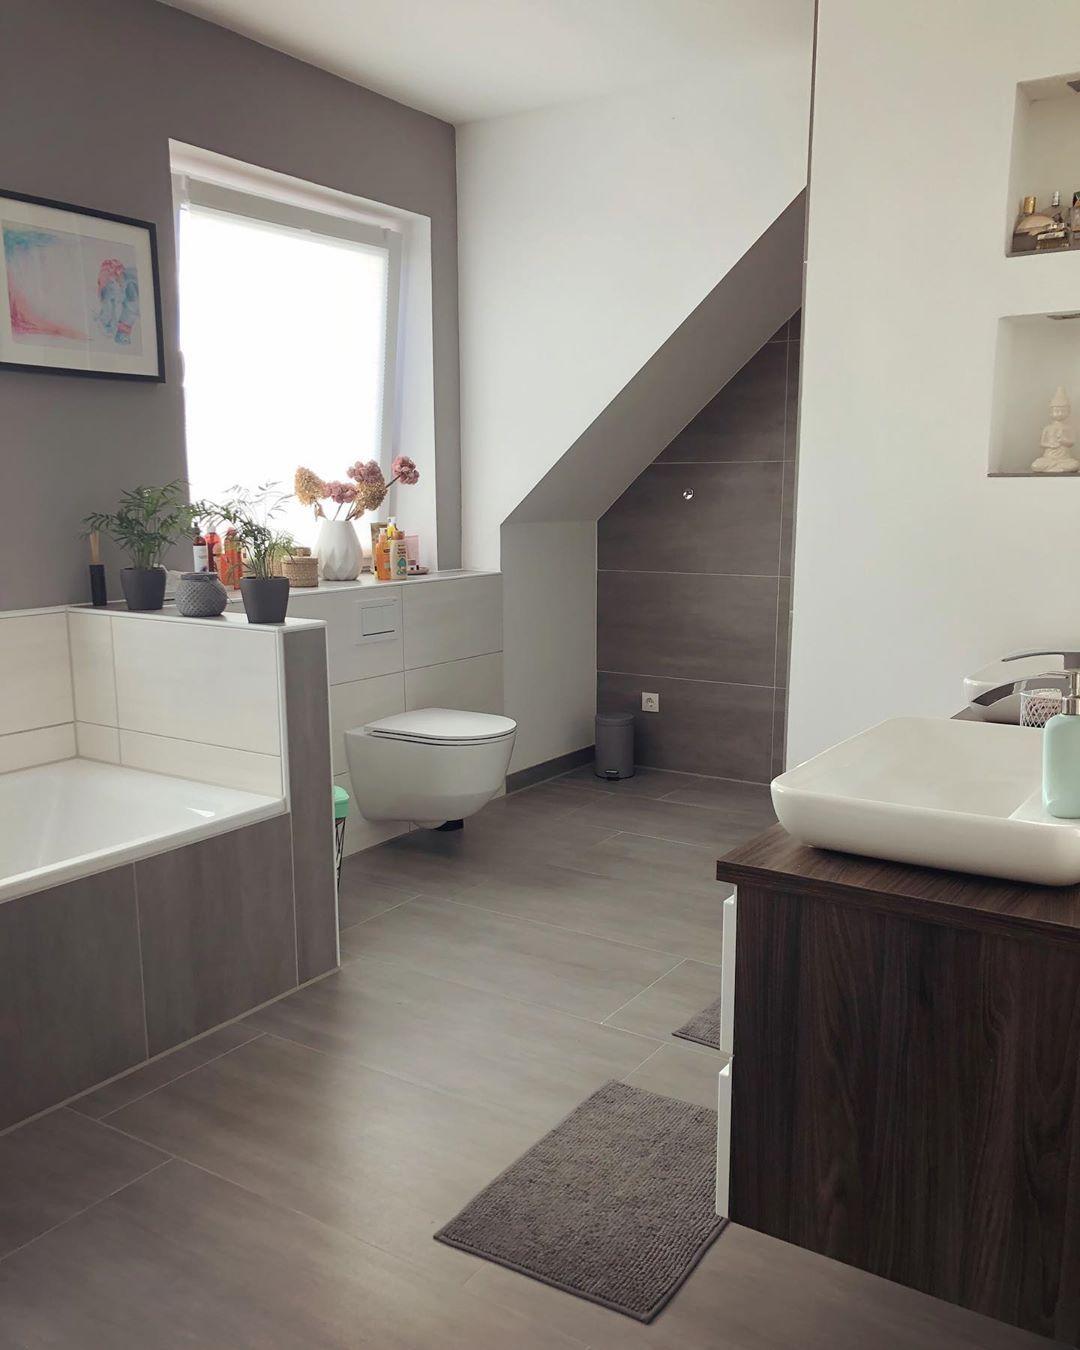 Badezimmer Homedesign Bad Bathroominspiration Bathroom Innenraumdesign Interior Schonerwohnen Wohnideen Badinspira Alcove Bathtub Bathroom Bathtub